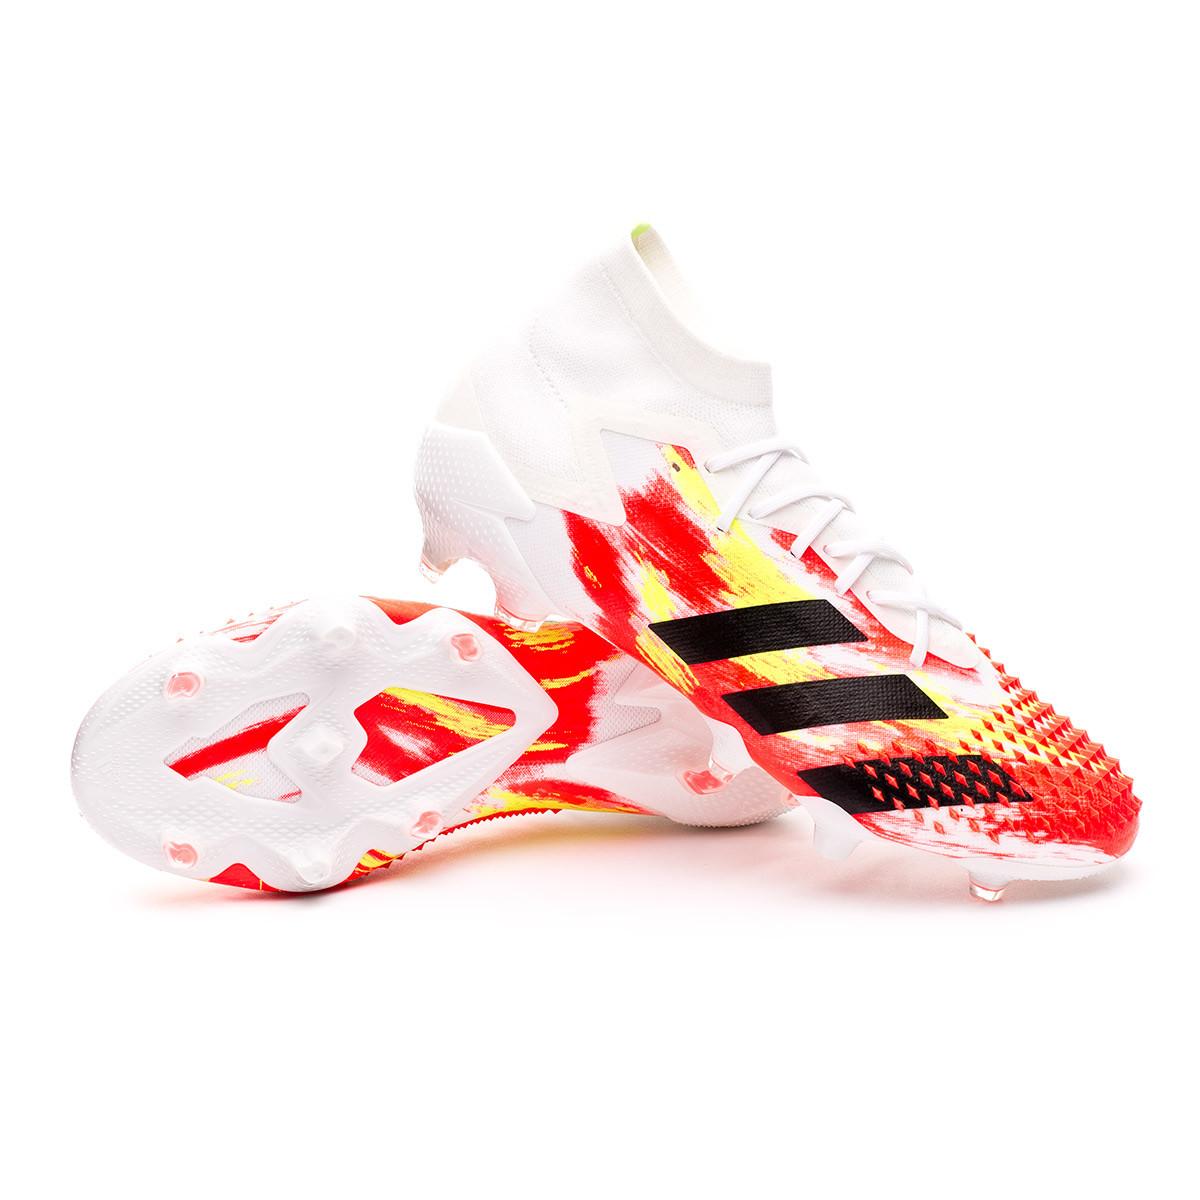 estafa cálmese Inspector  Football Boots adidas Predator 20.1 FG White-Black-Pop - Football store Fútbol  Emotion